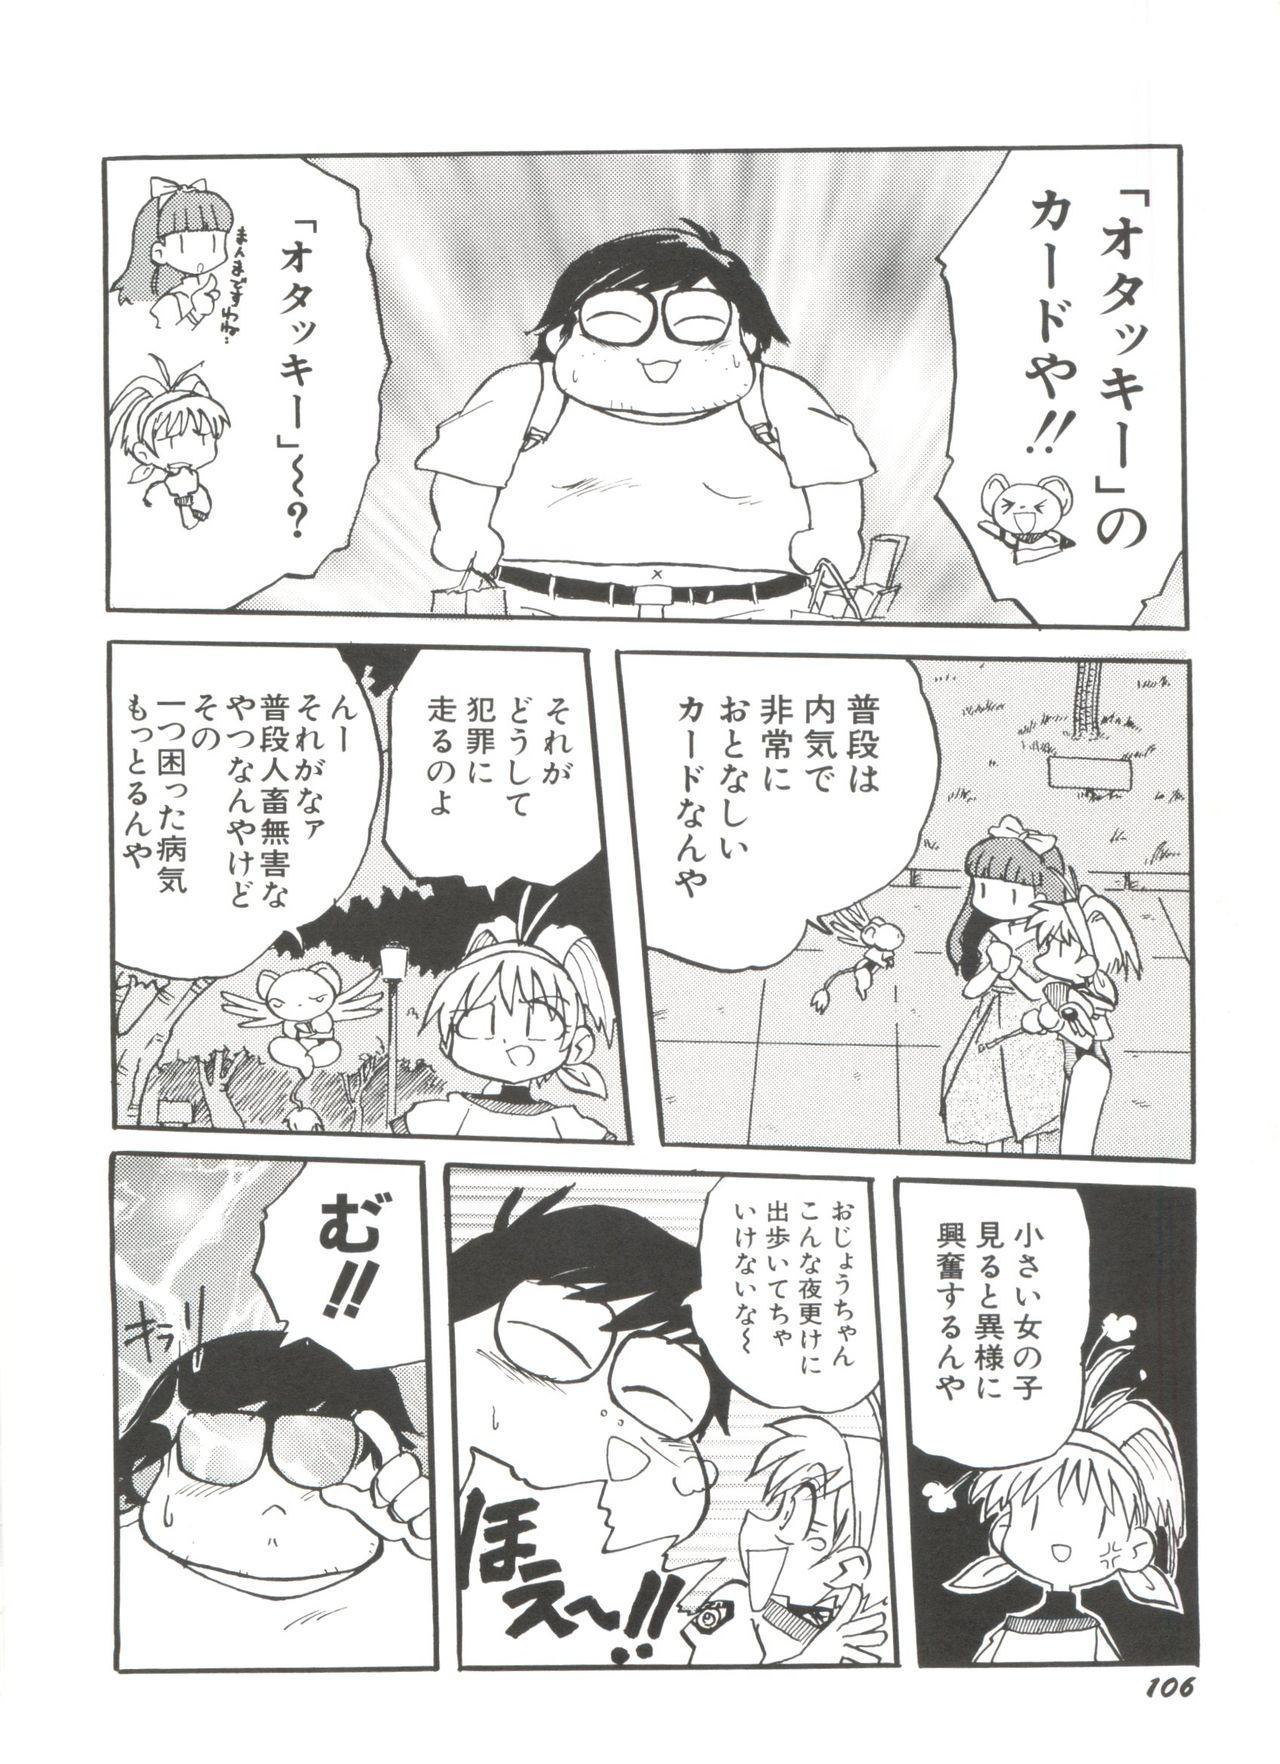 [Anthology] Denei Tamatebako 8 - Utakata no Tenshi-tachi II (Various) 107